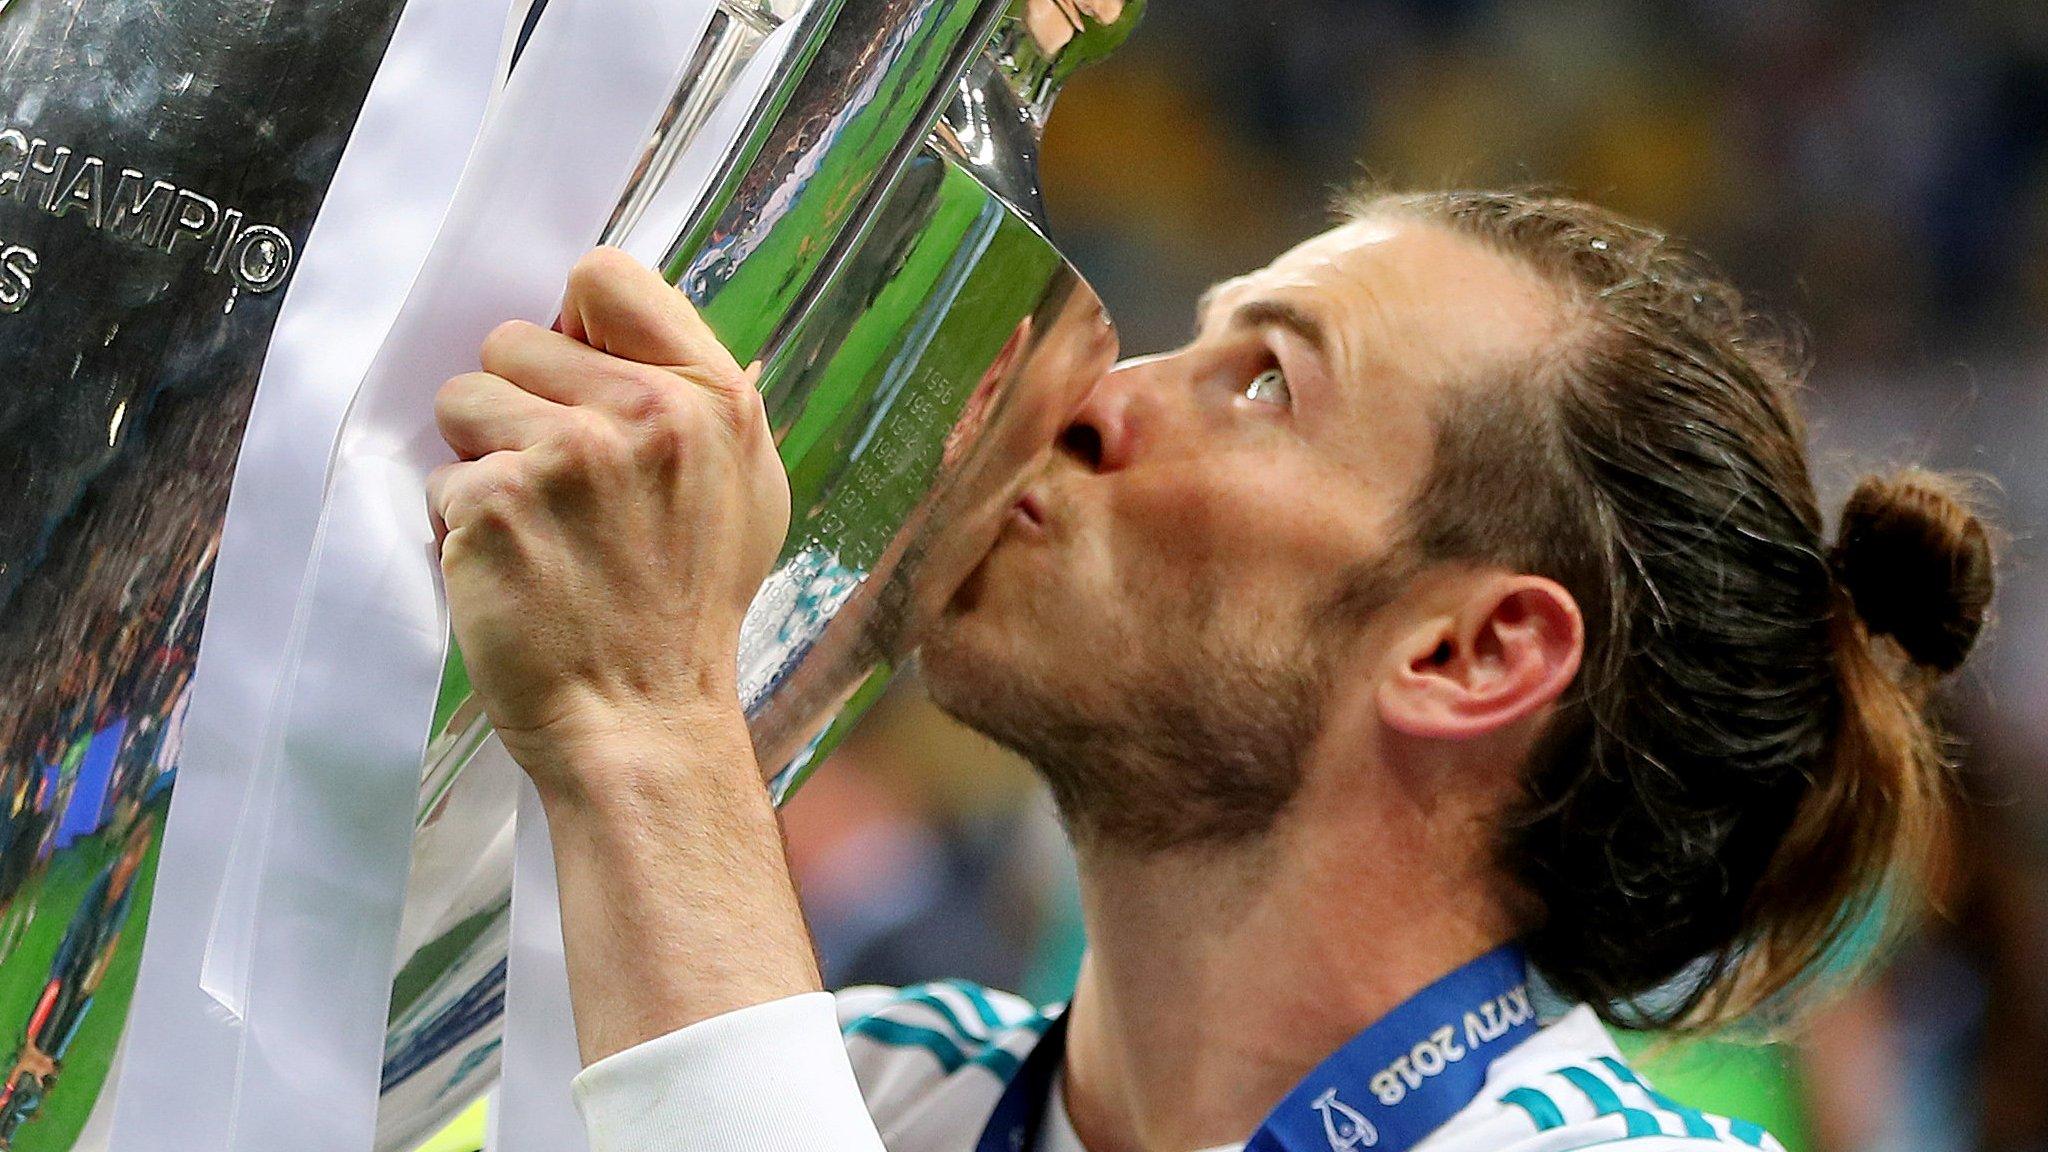 Football gossip: Hazard, Bale, Perisic, Kovacic, Higuain, Golovin, Ings, Welbeck